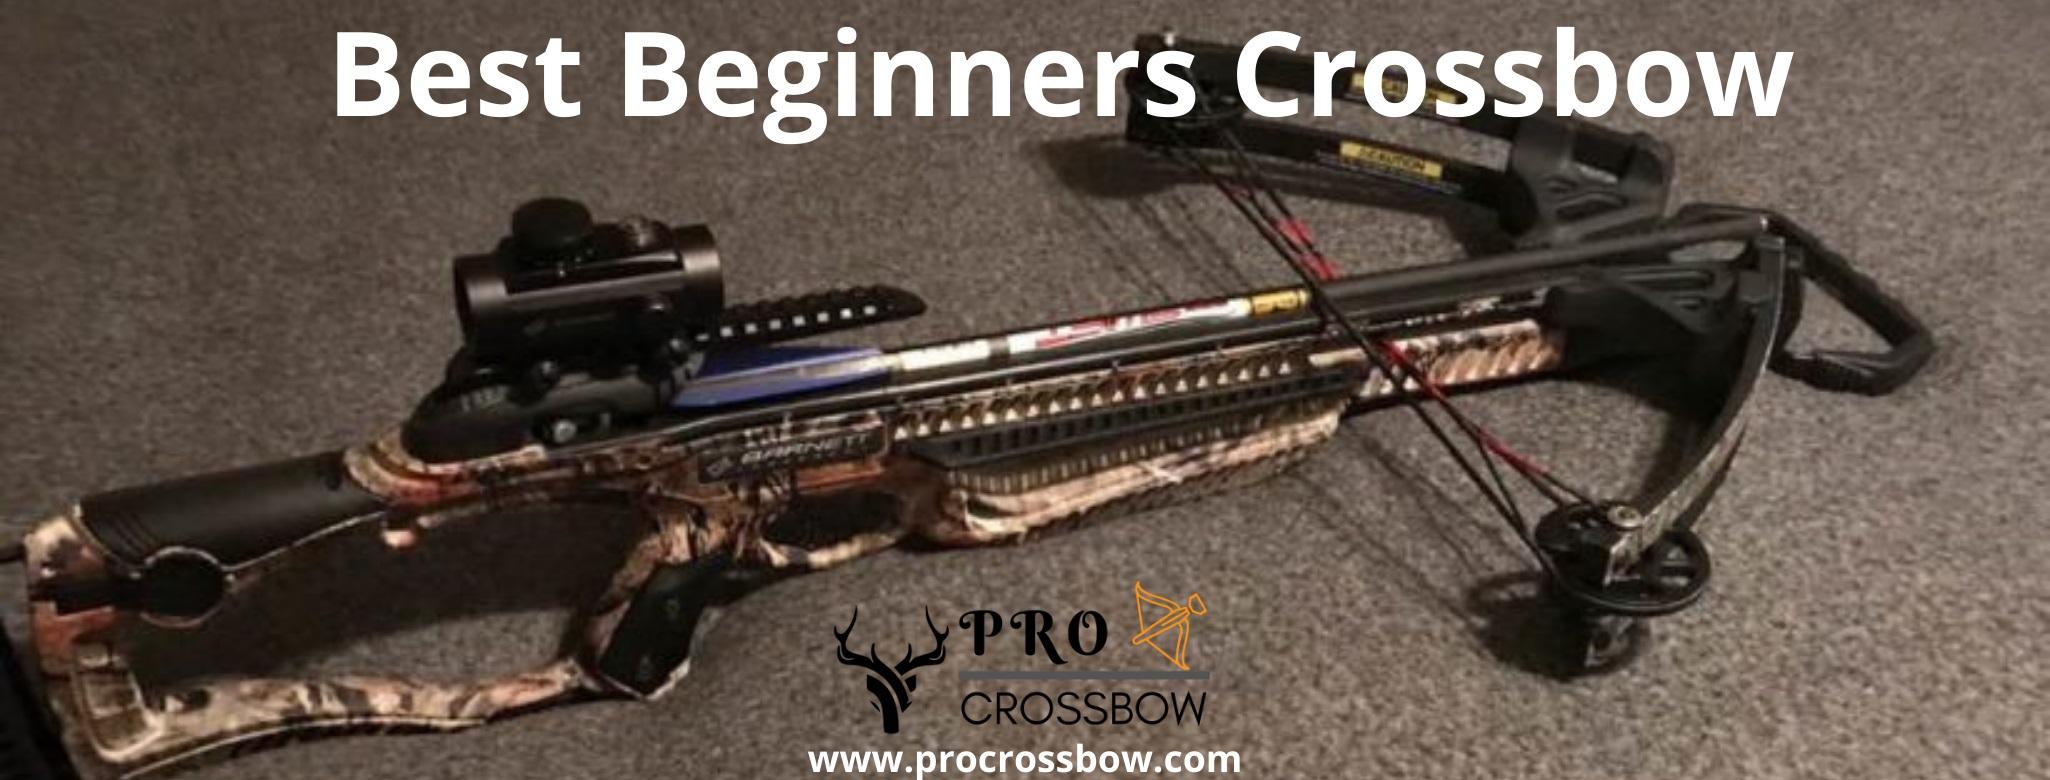 best beginners crossbow